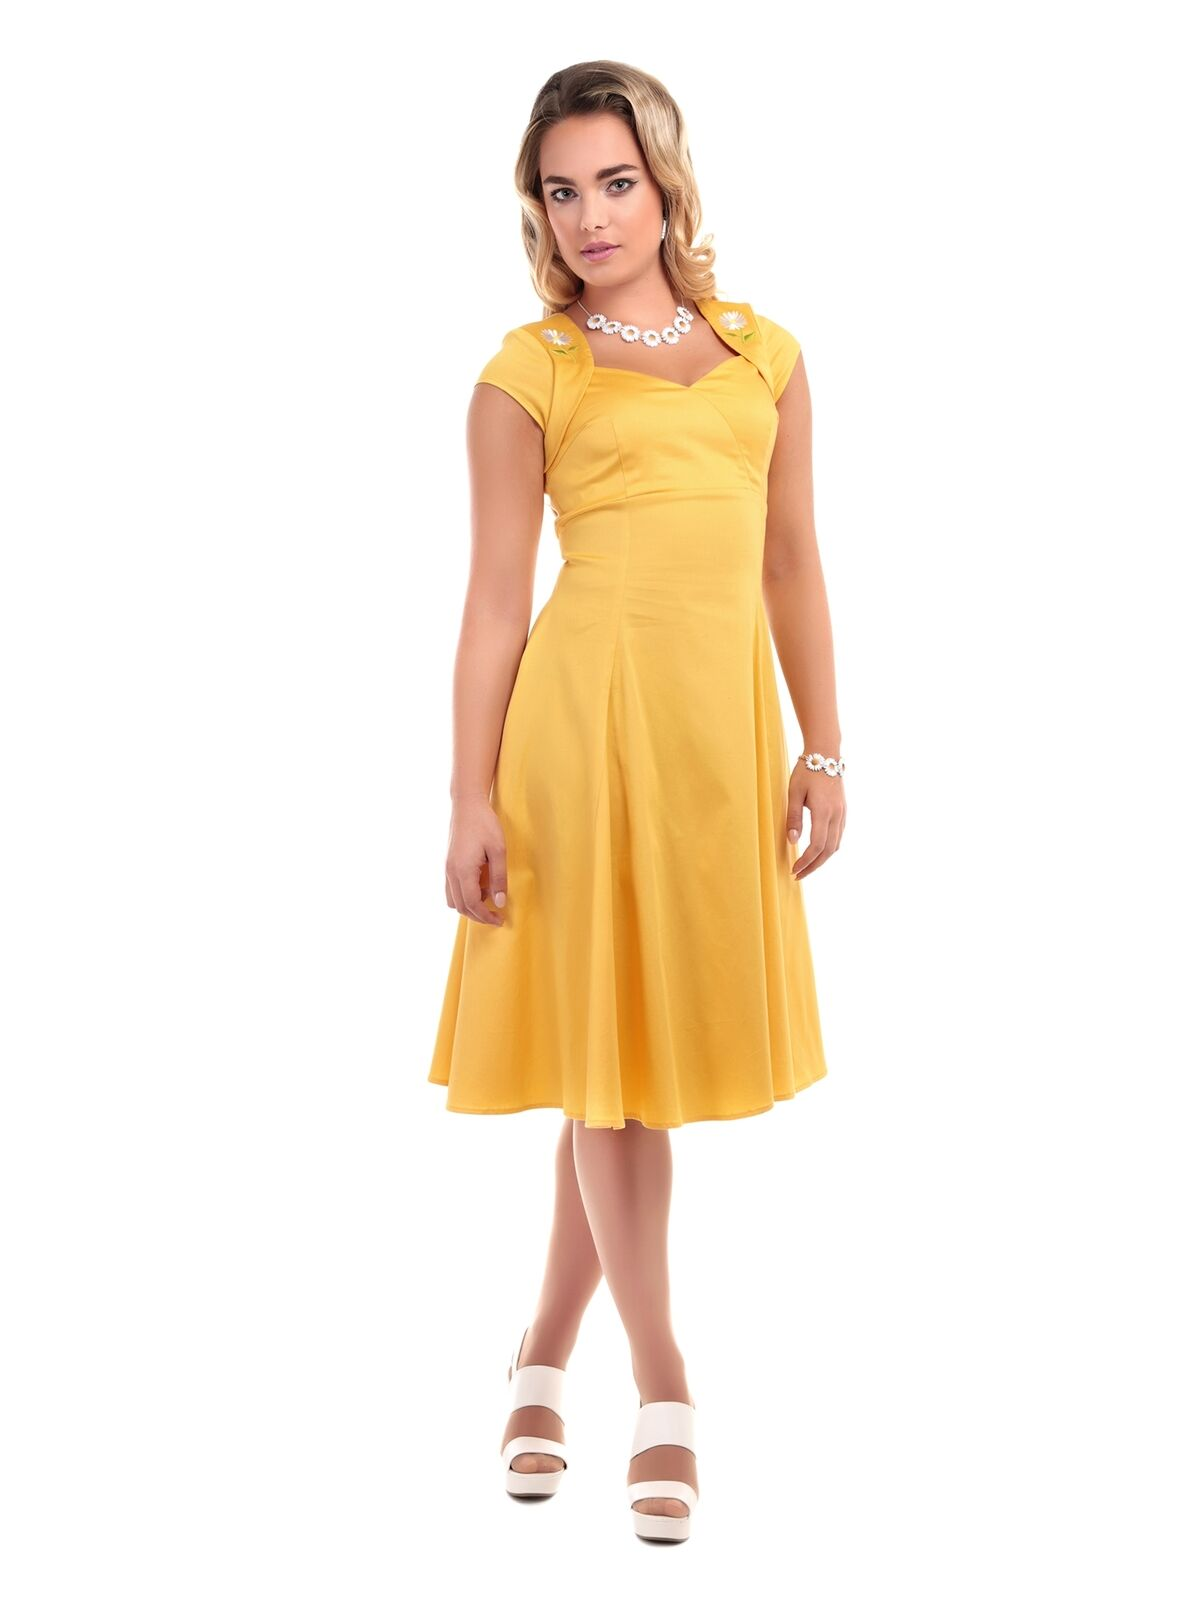 COLLECTIF VINTAGE SZ 10 - 22 YELLOW REGINA DAISY DOLL DRESS 1950S FLARED